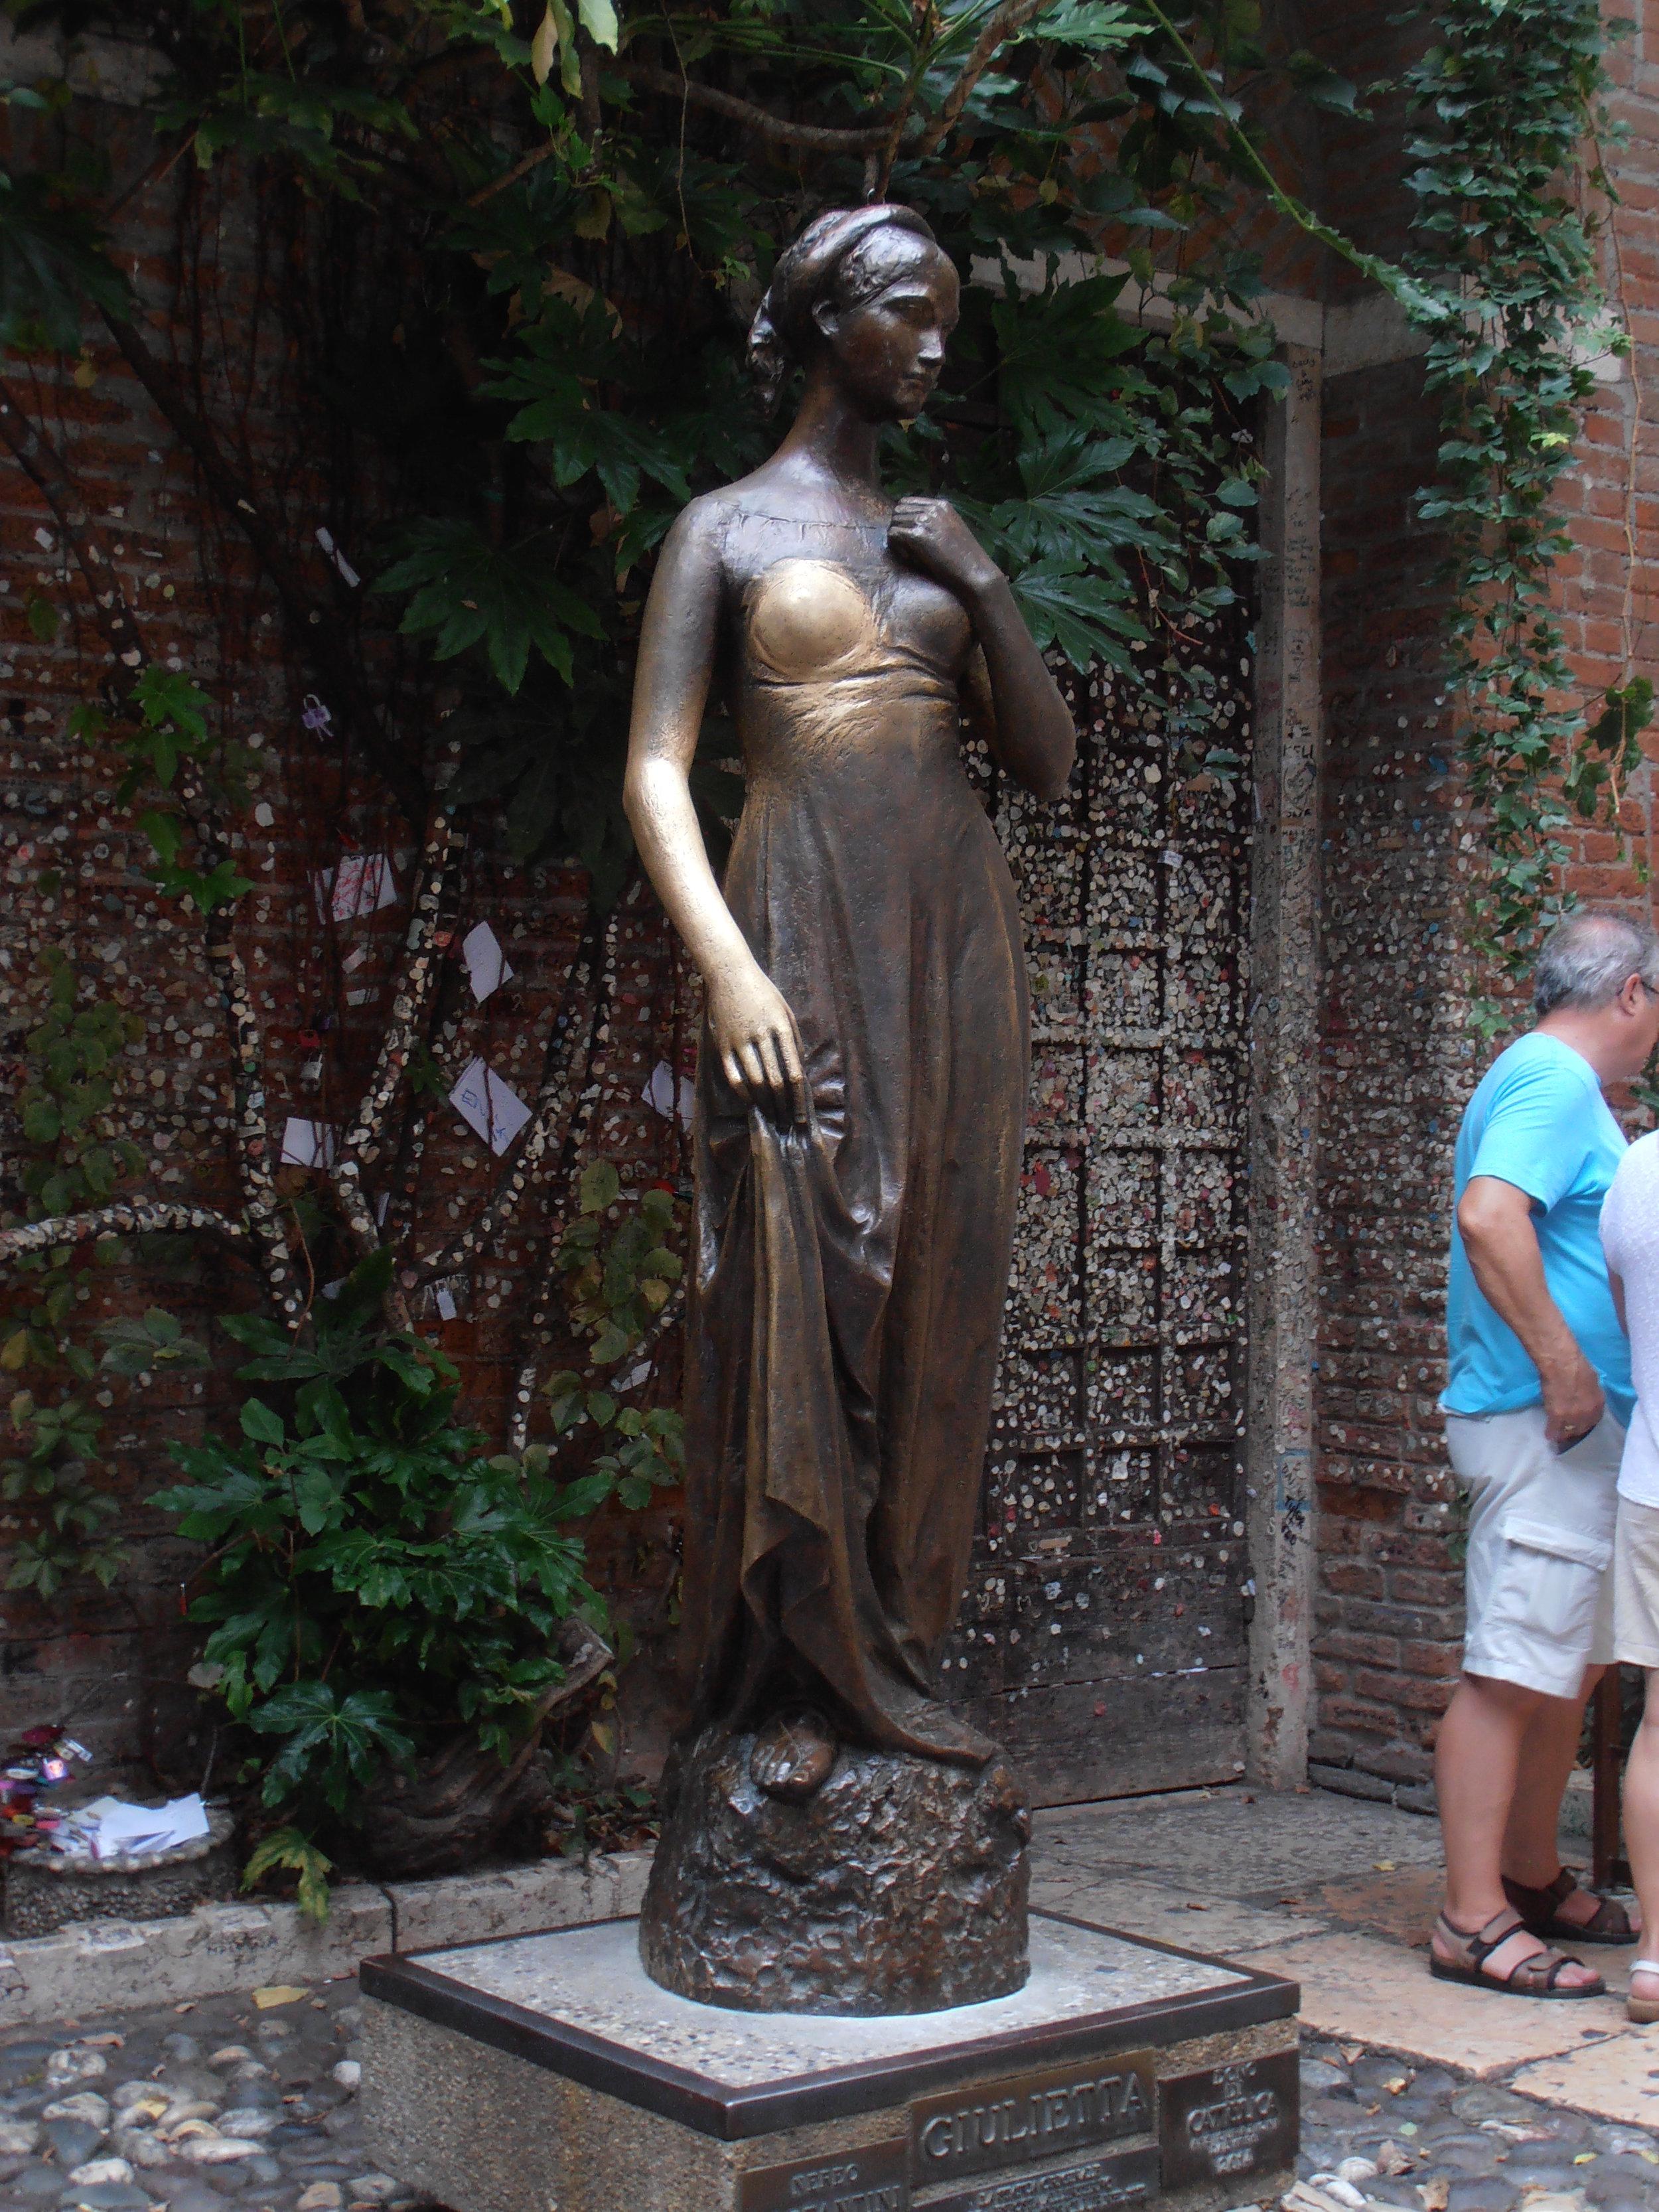 The Juliet statue